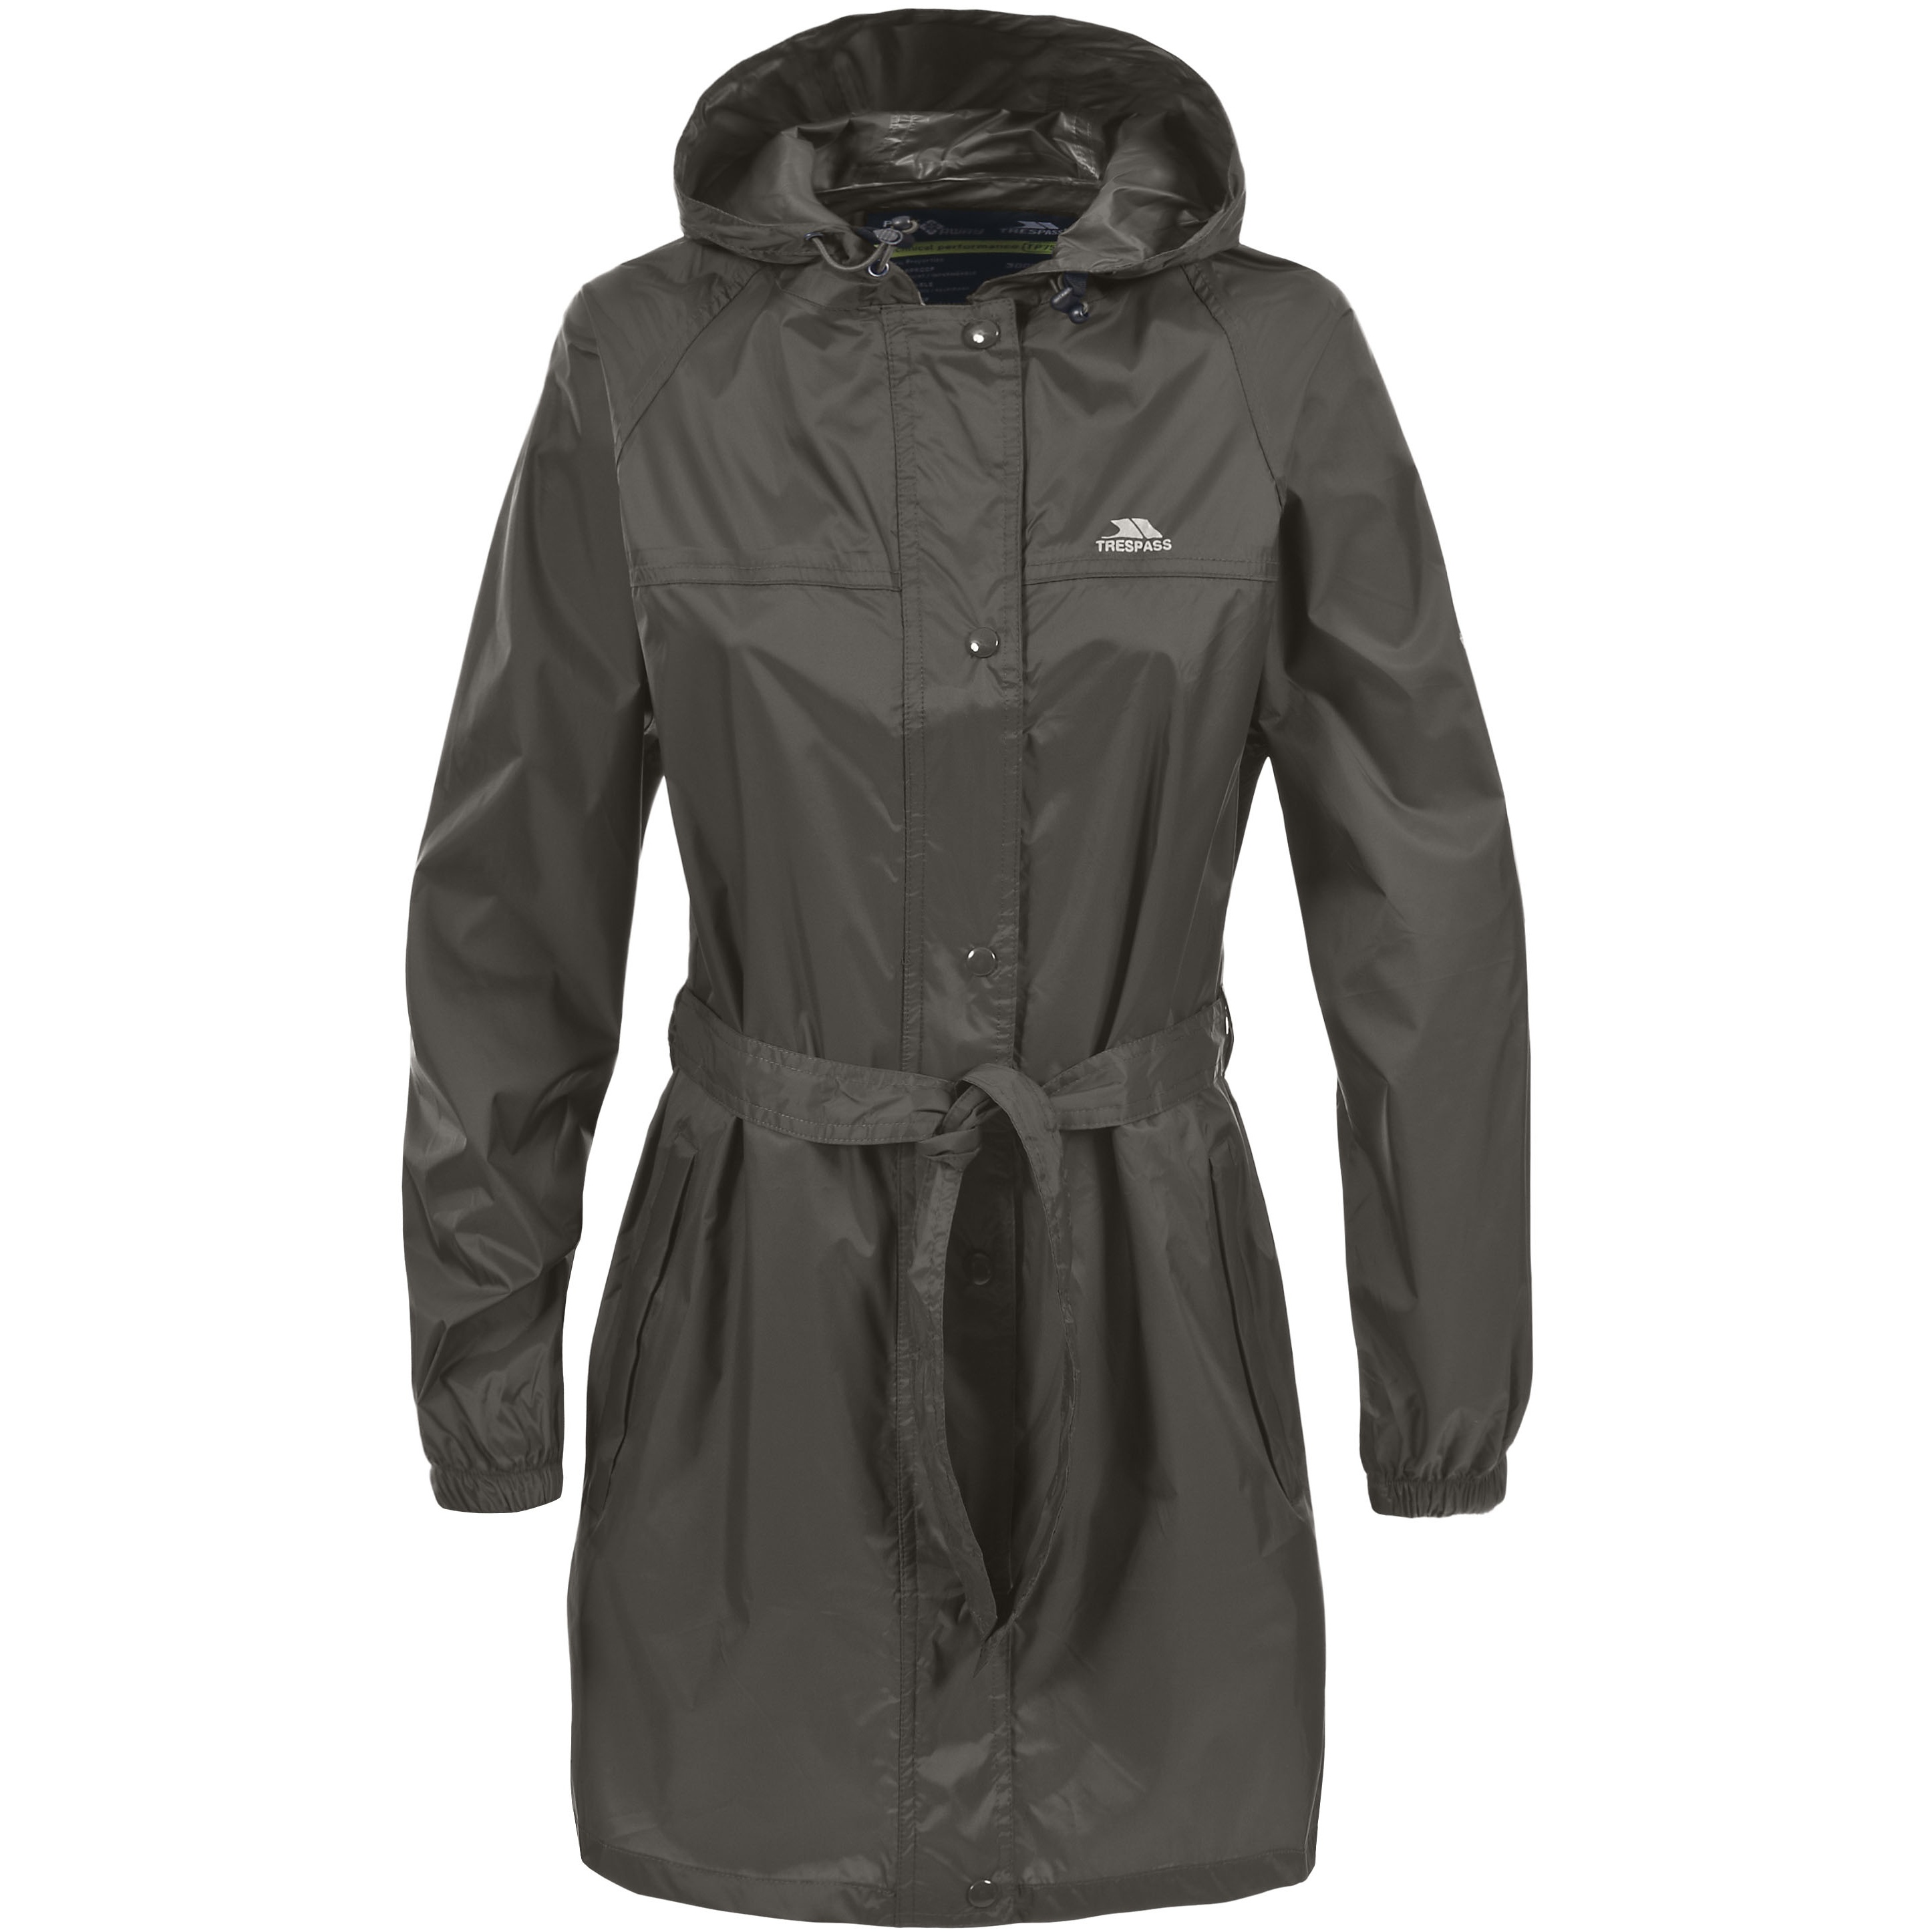 Womens waterproof jackets with hood